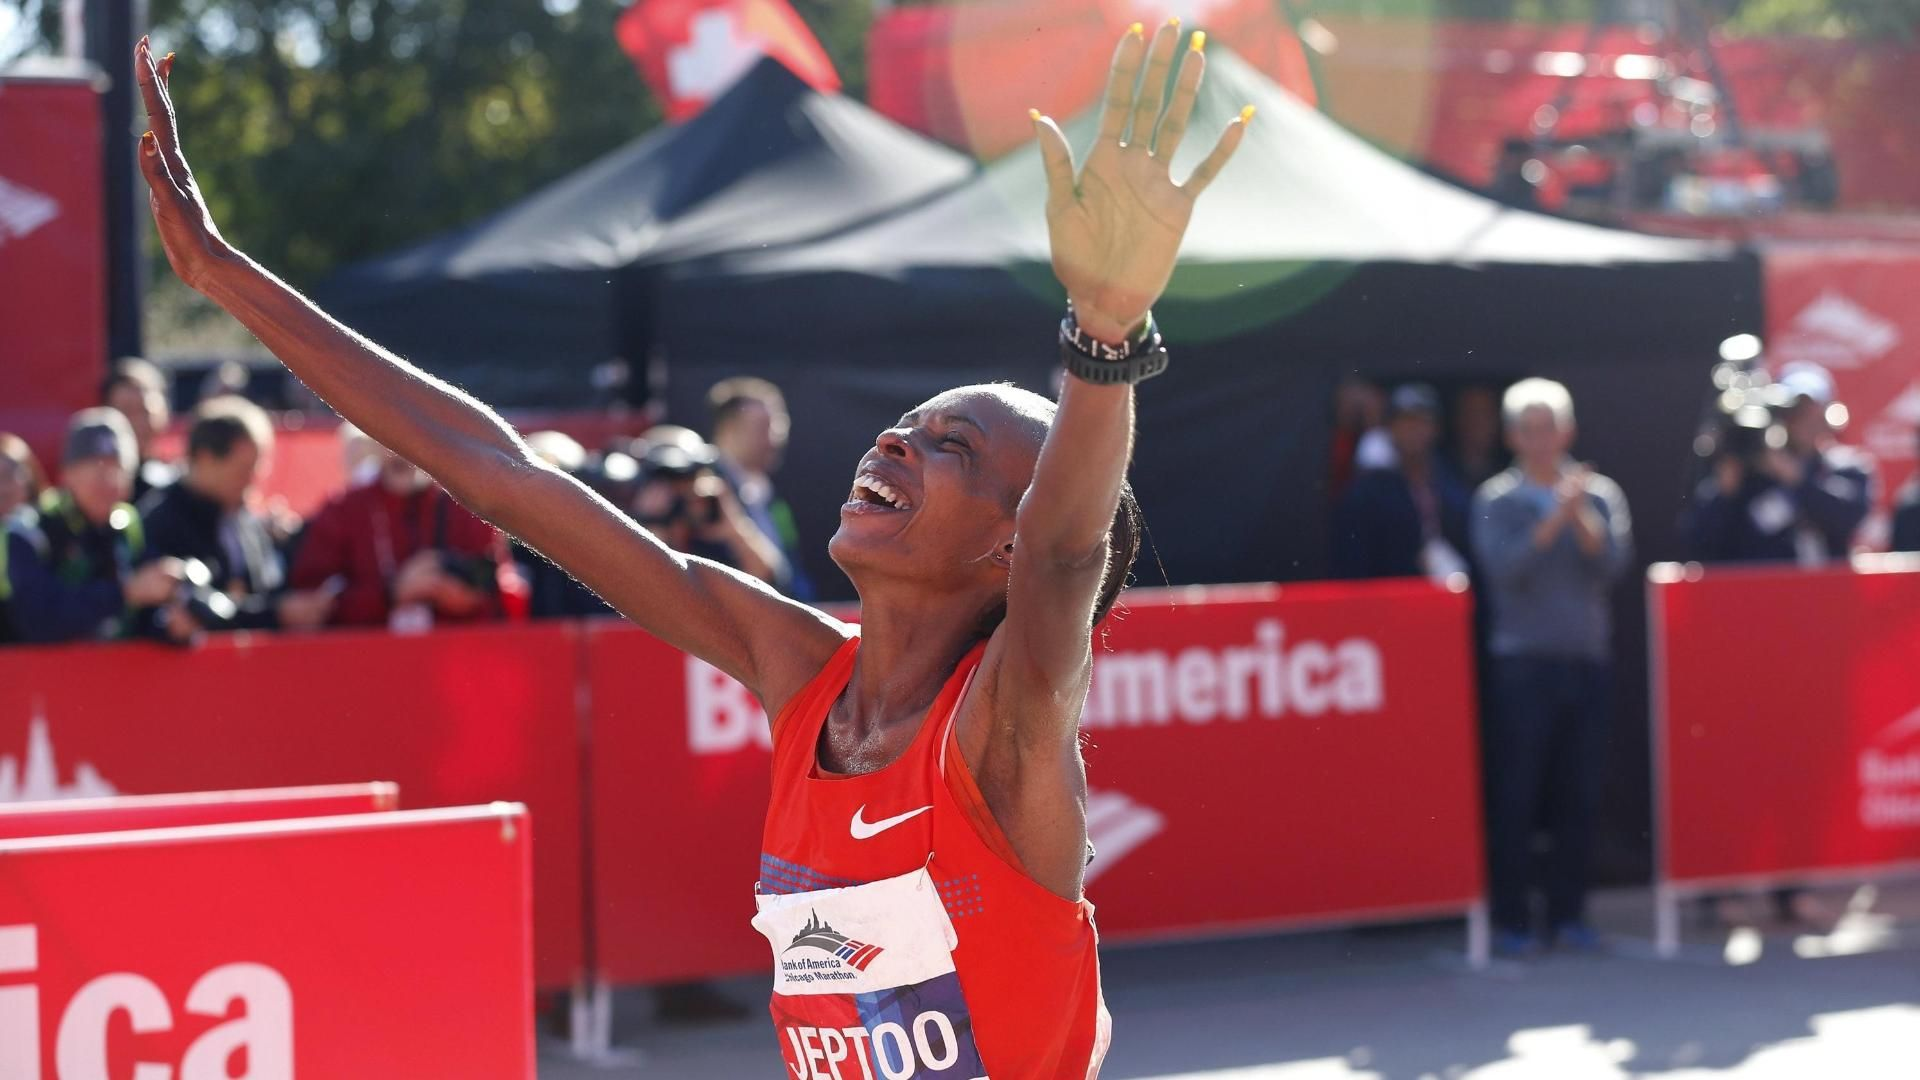 Chicago Marathon Champ Fails Doping Test